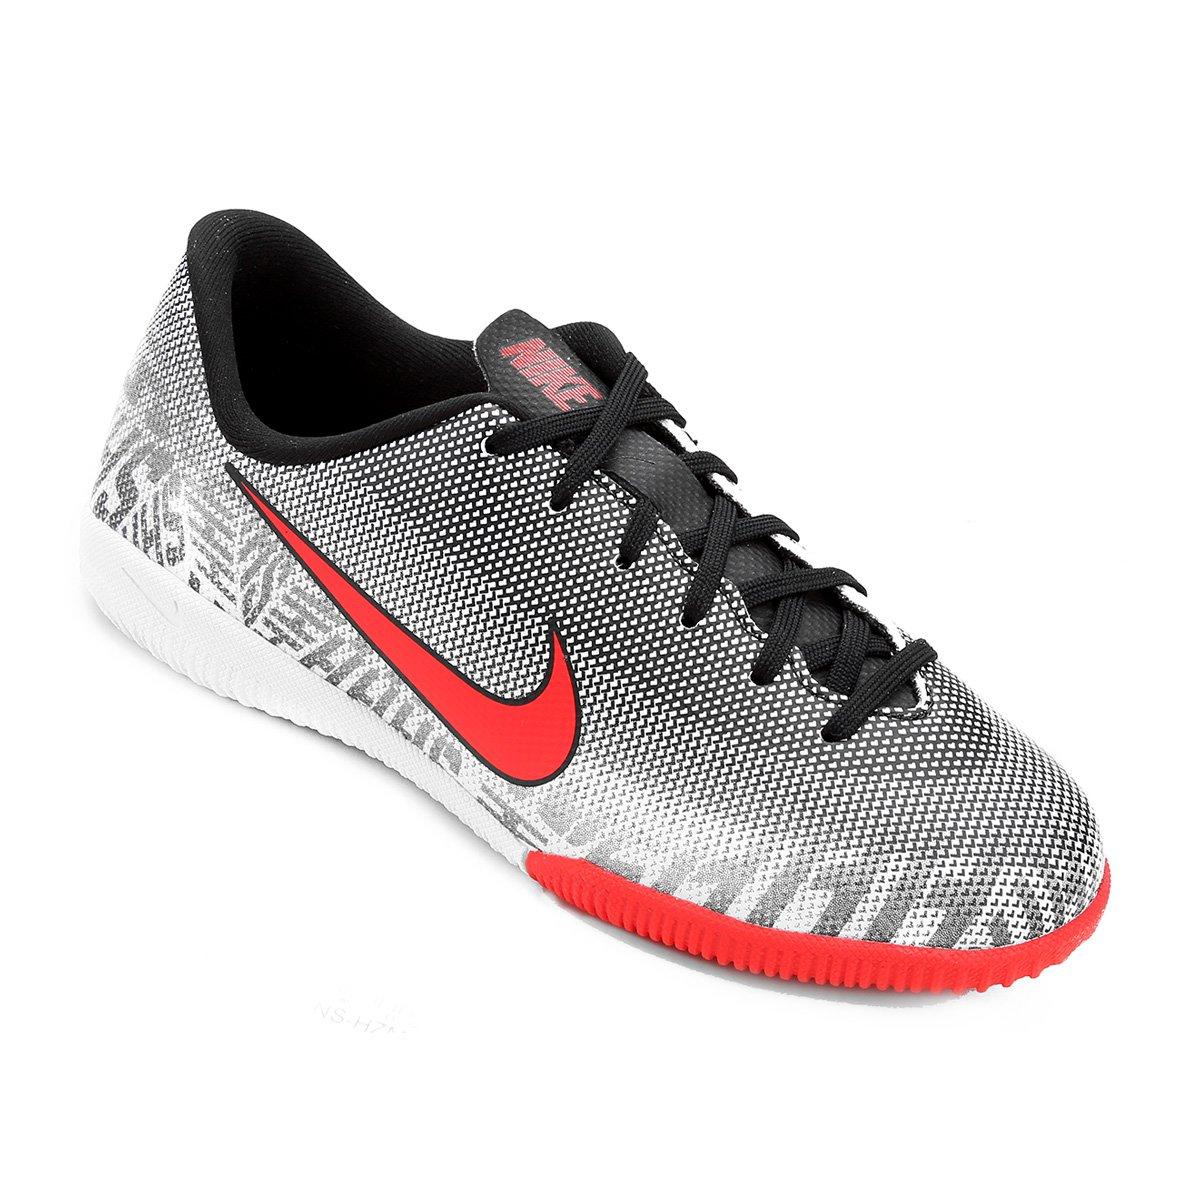 f4be9e9dd Chuteira Futsal Infantil Nike Mercurial Vapor 12 Academy Gs Neymar Jr IC -  Branco e Vermelho